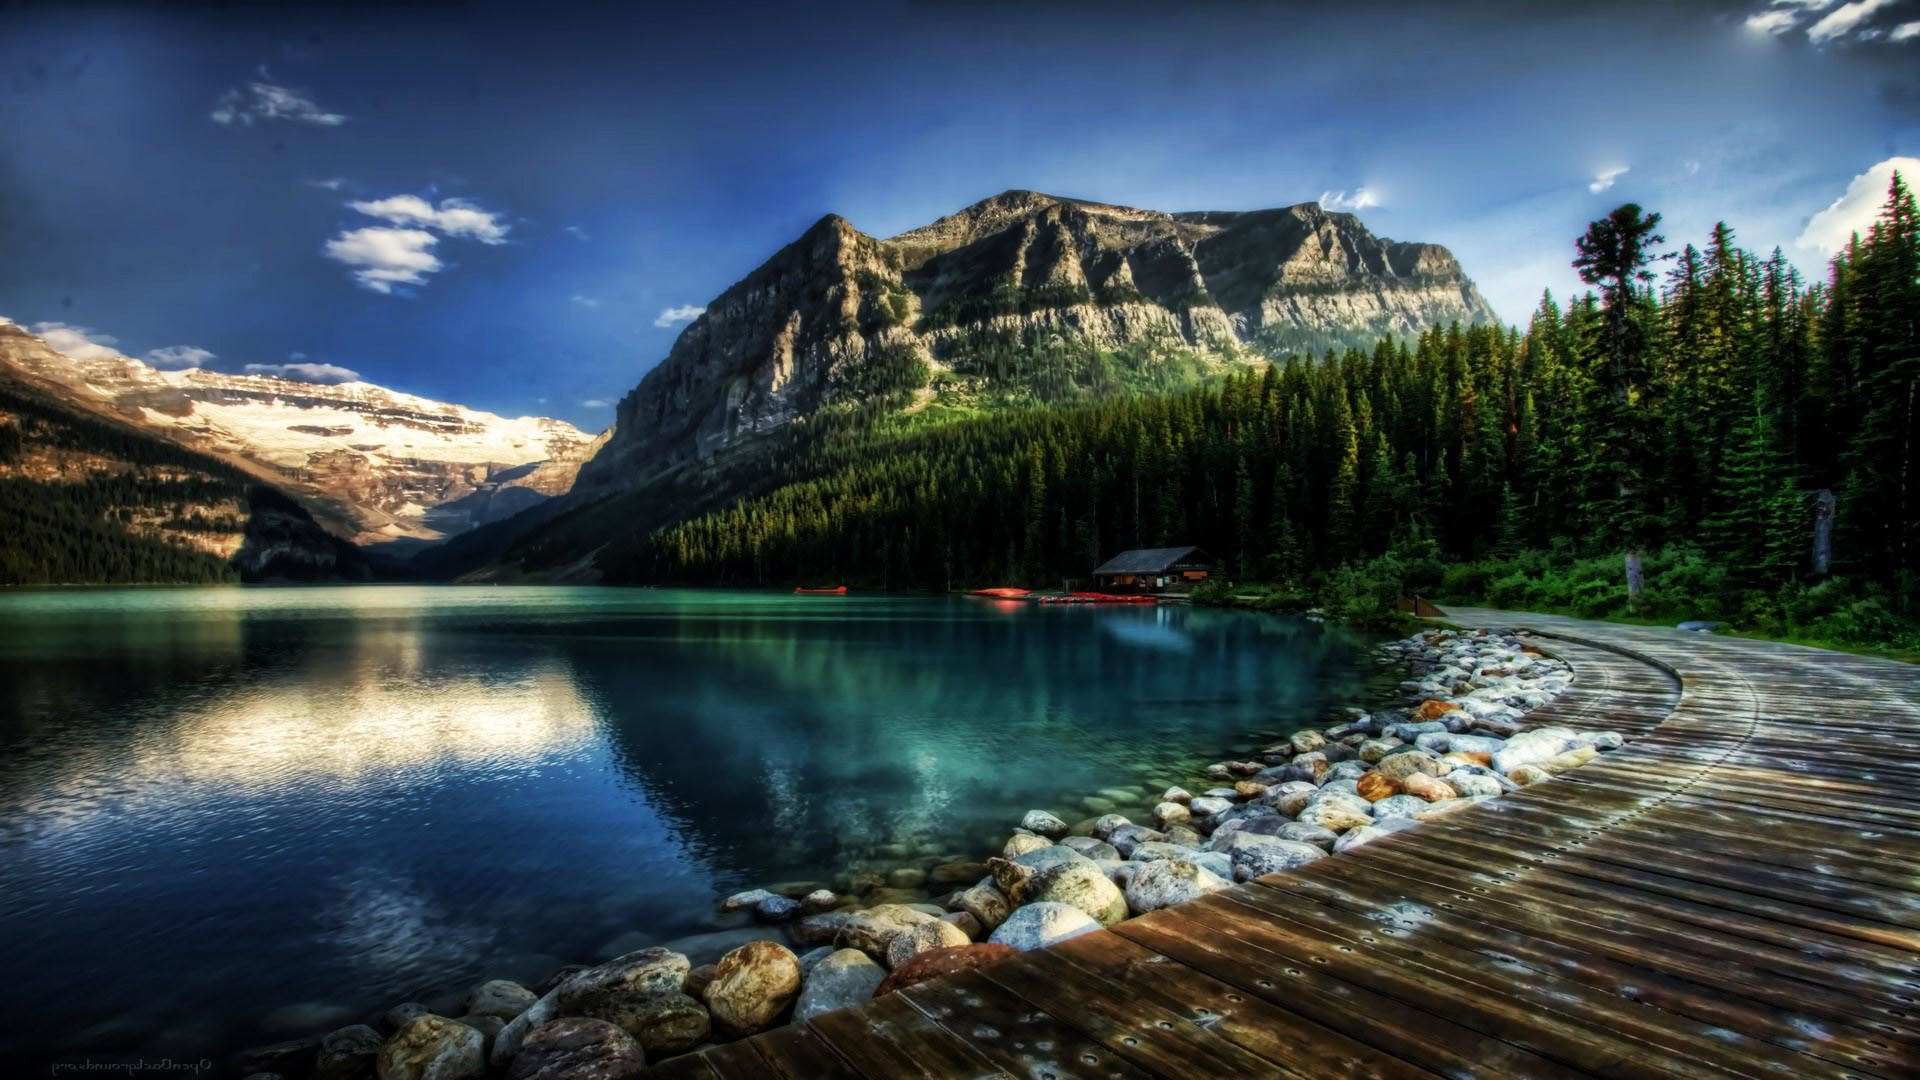 largest-waterfall-landscape-wallpaper-7 | Wallpapers | Pinterest | Wallpaper